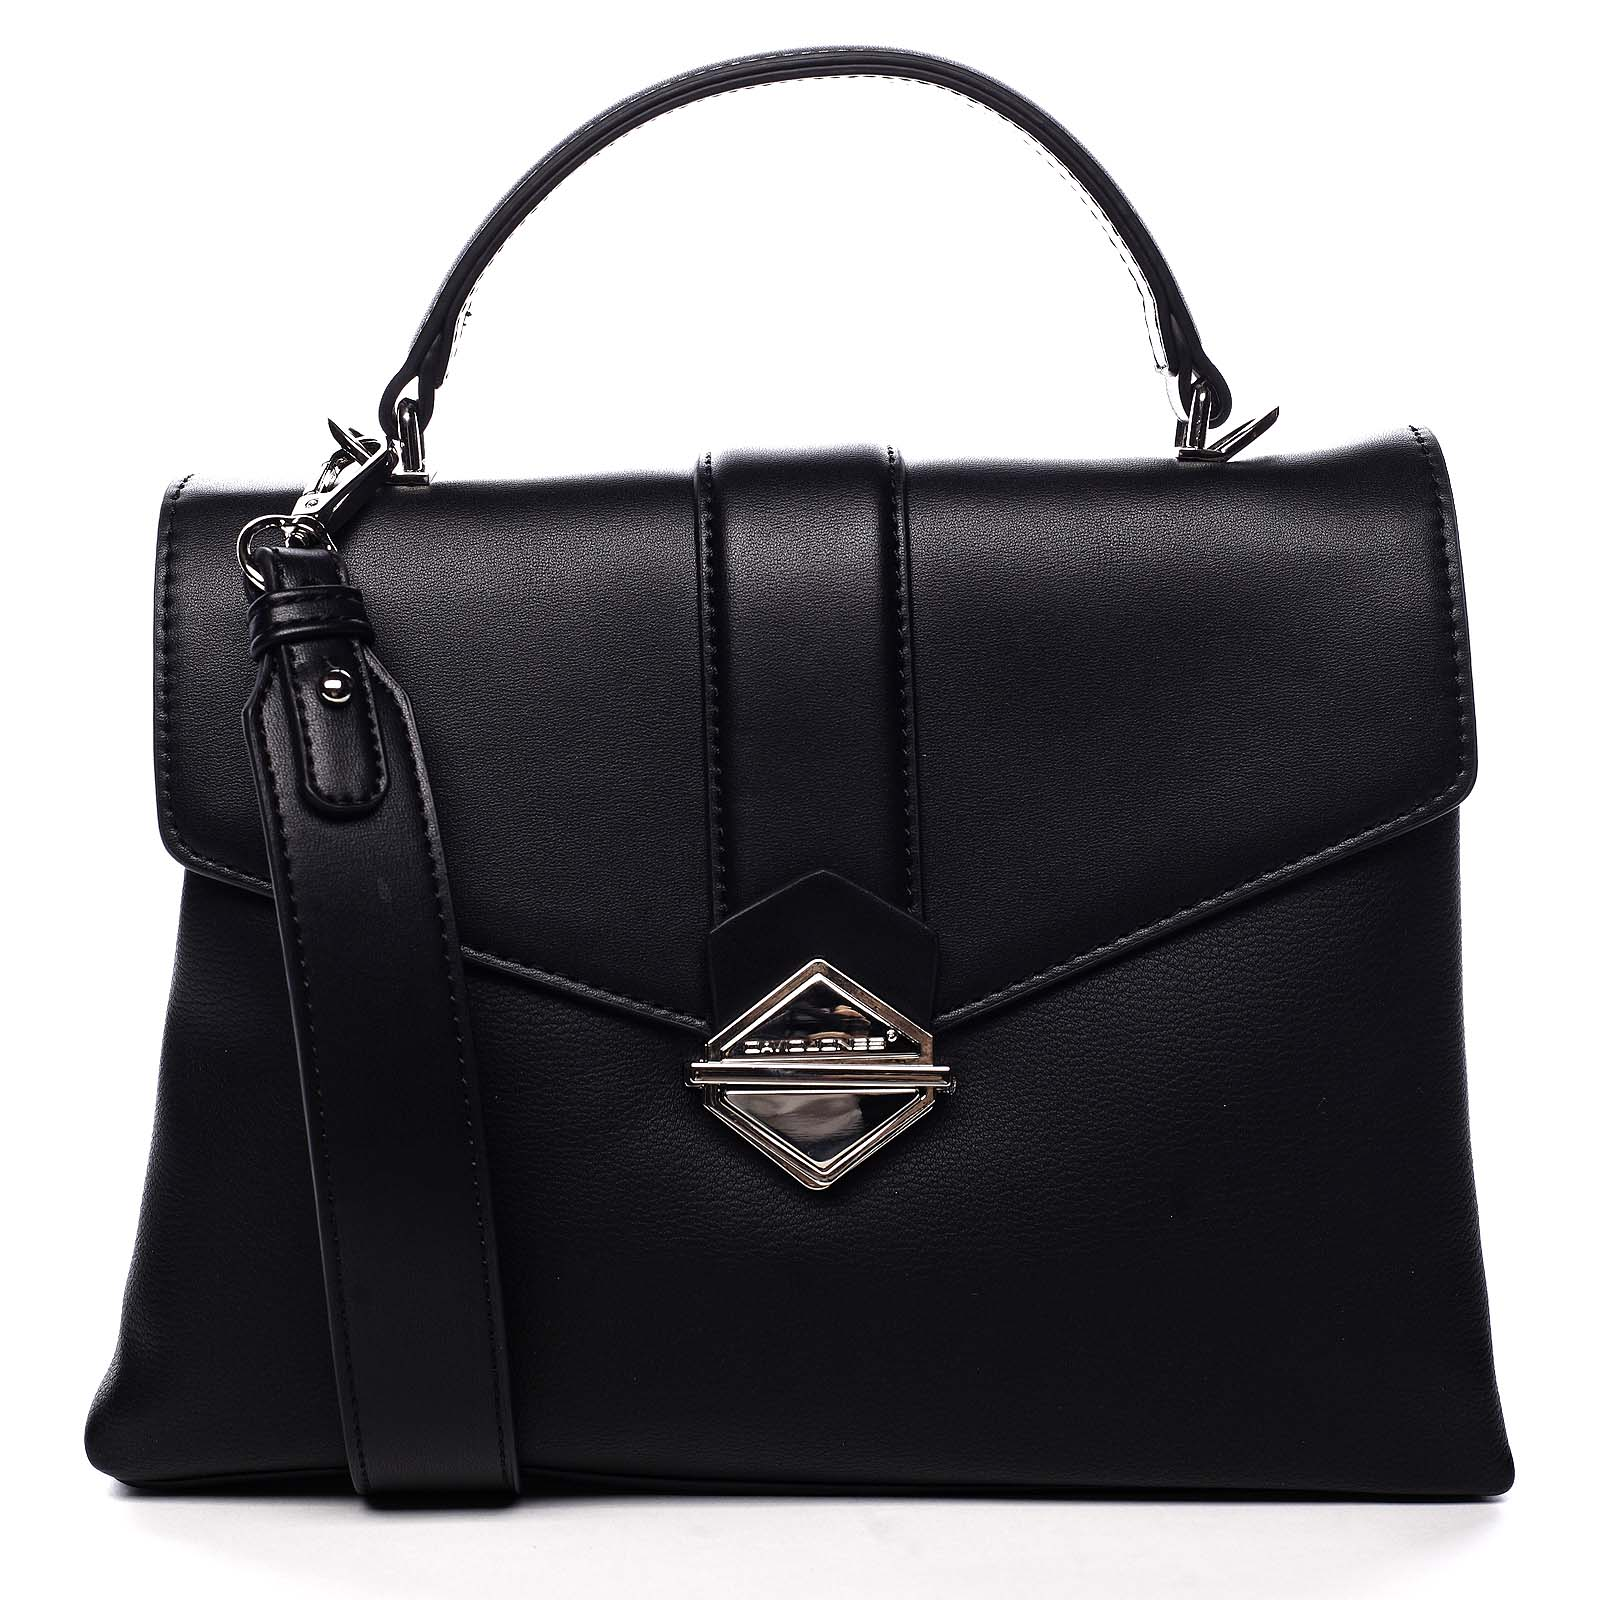 Dámska kabelka do ruky čierna - David Jones Africa